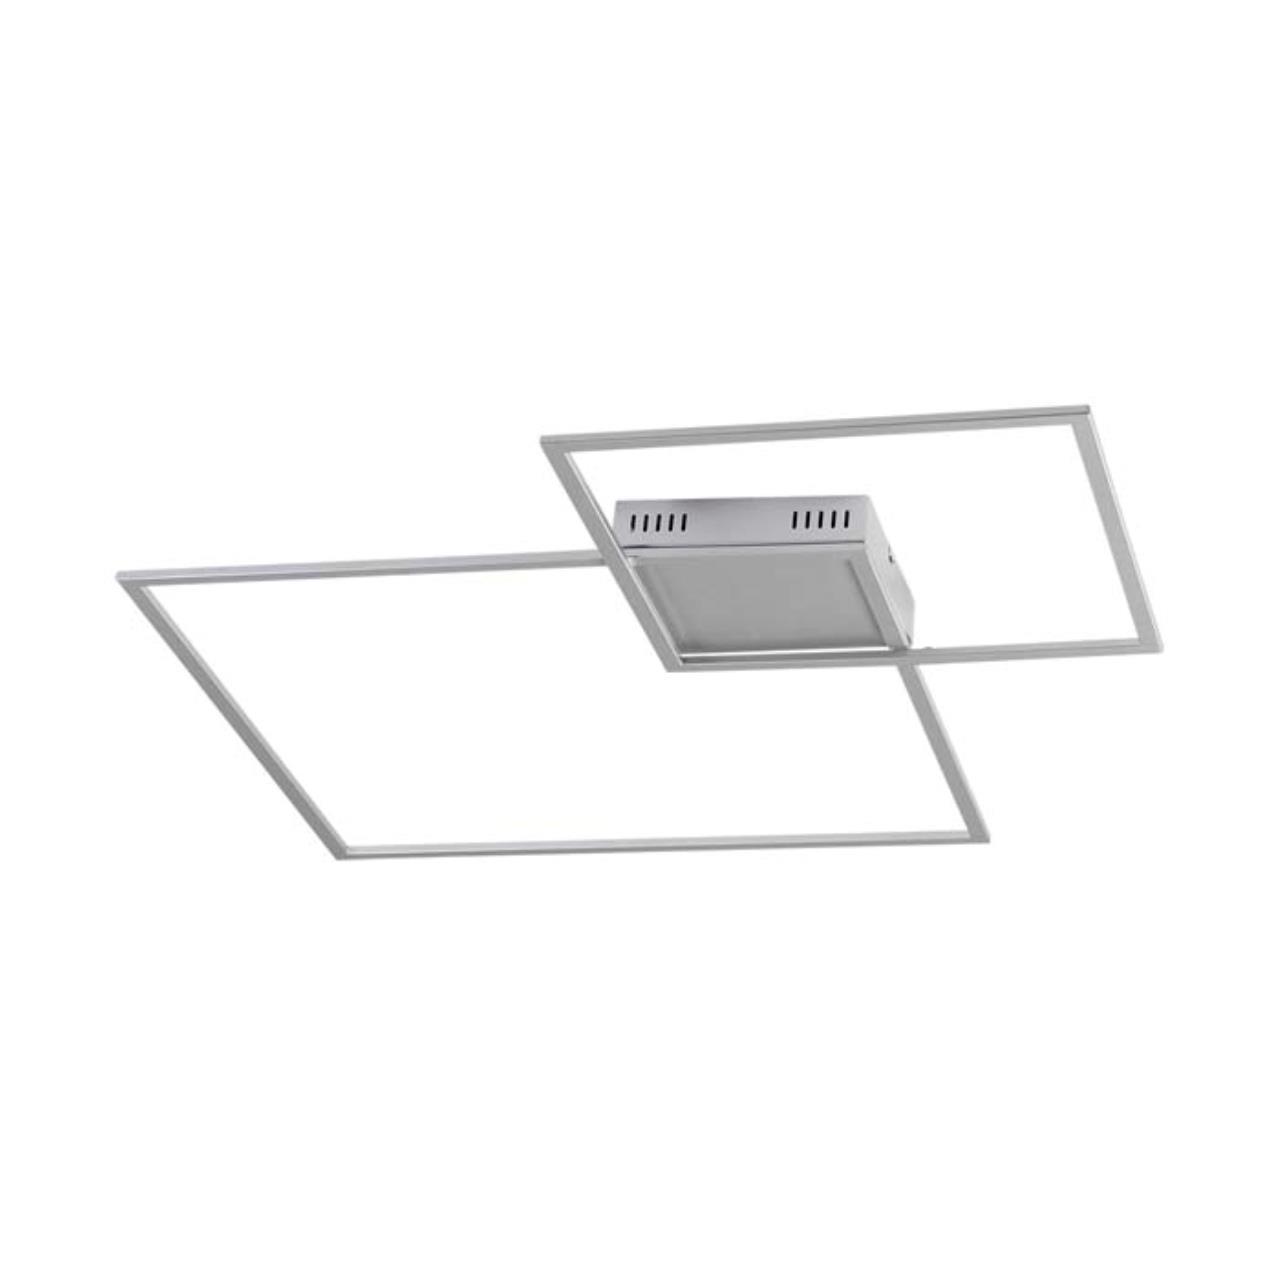 3558/36CL L-VISION ODL18 серебристый Н/п светильник IP20 LED 36W 4000K 2400Лм 220V QUADRALED